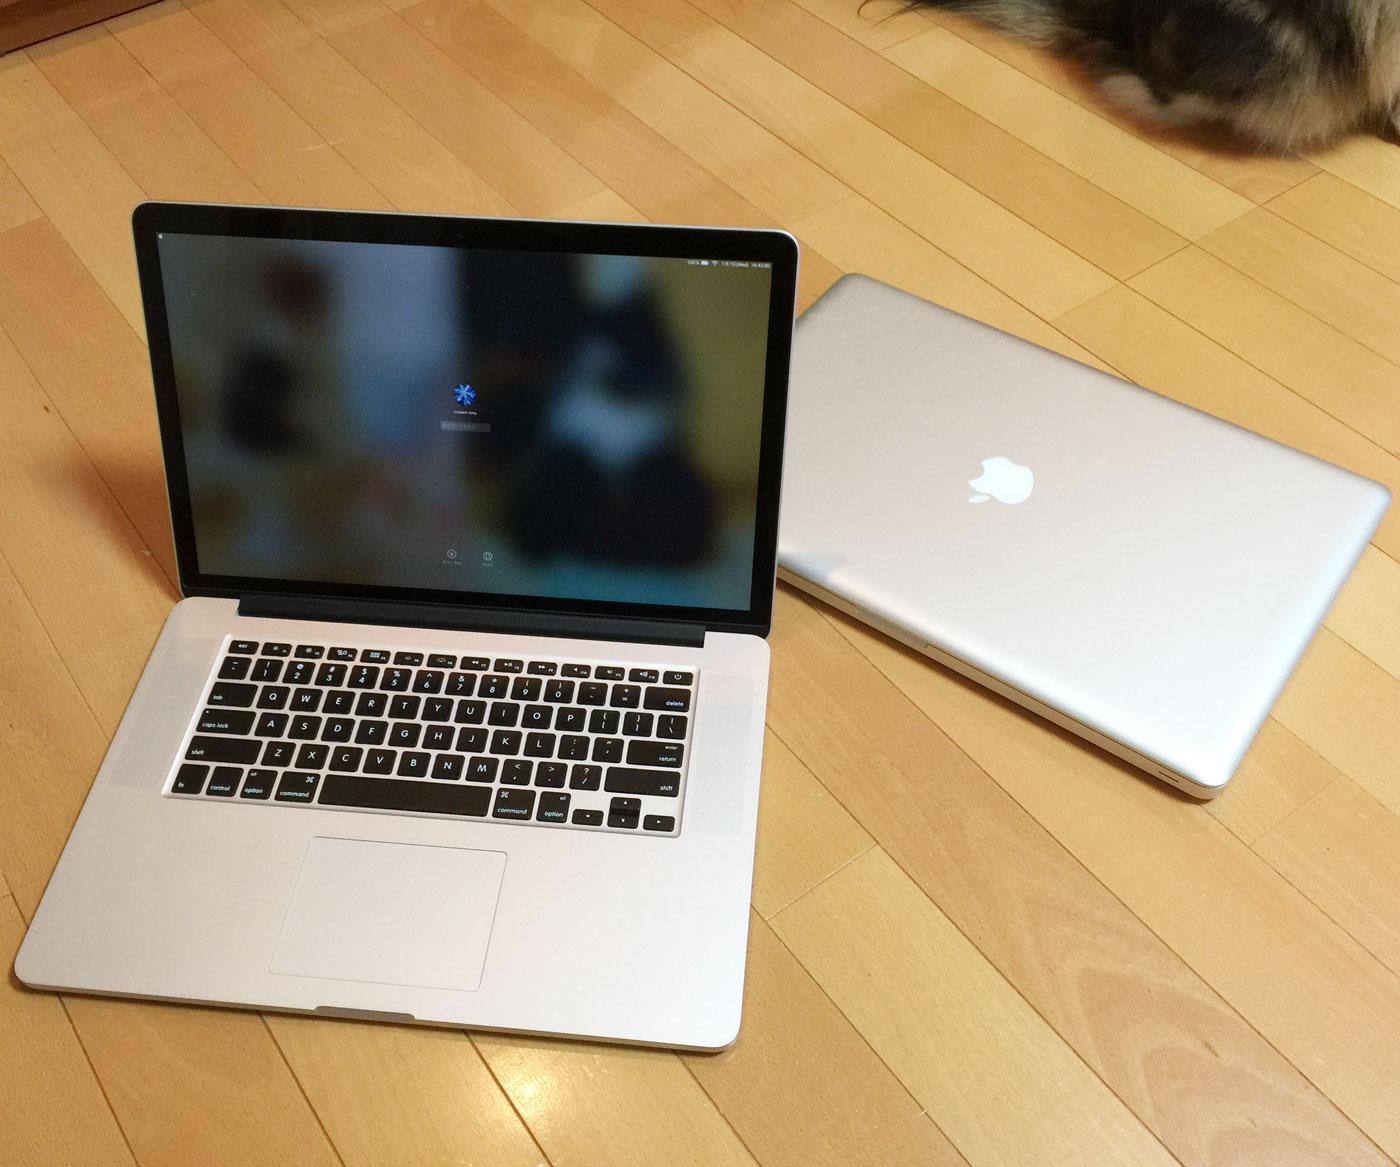 MacBook Pro Retinaディスプレイモデル 15インチとMacBook Pro 17インチ